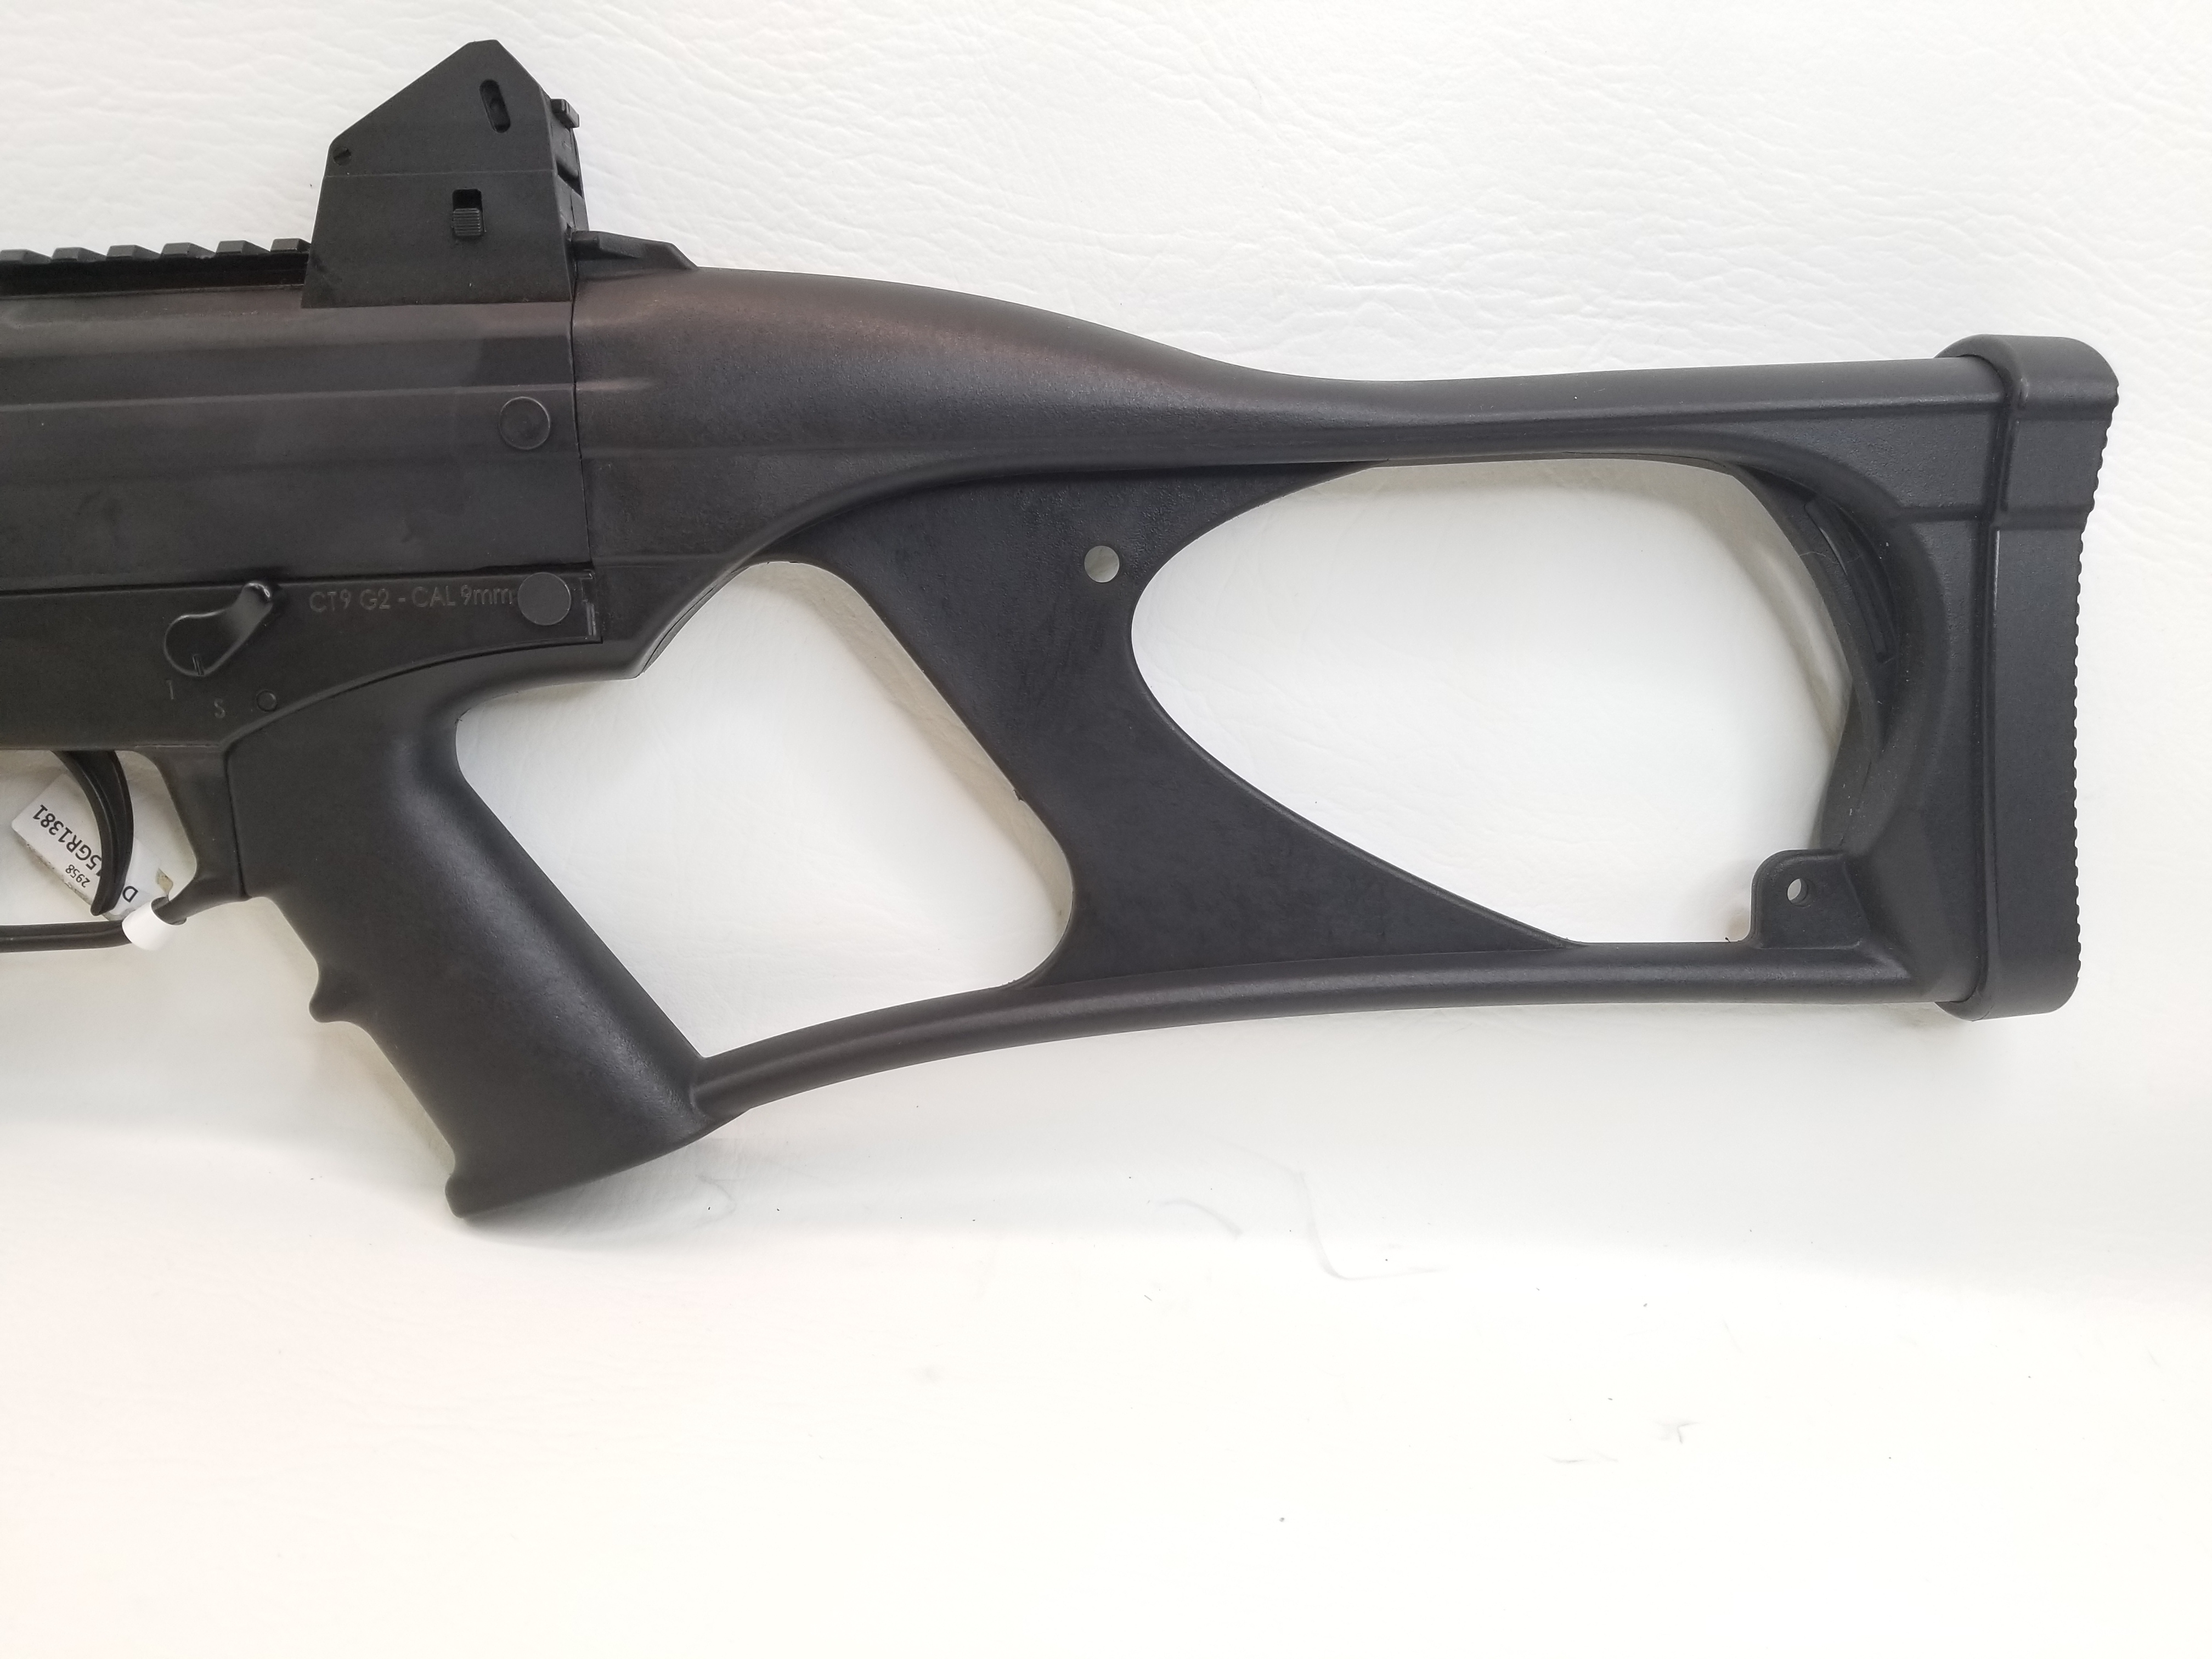 Taurus Bolt Action Rifle Model CT9G2 9mm-img-2